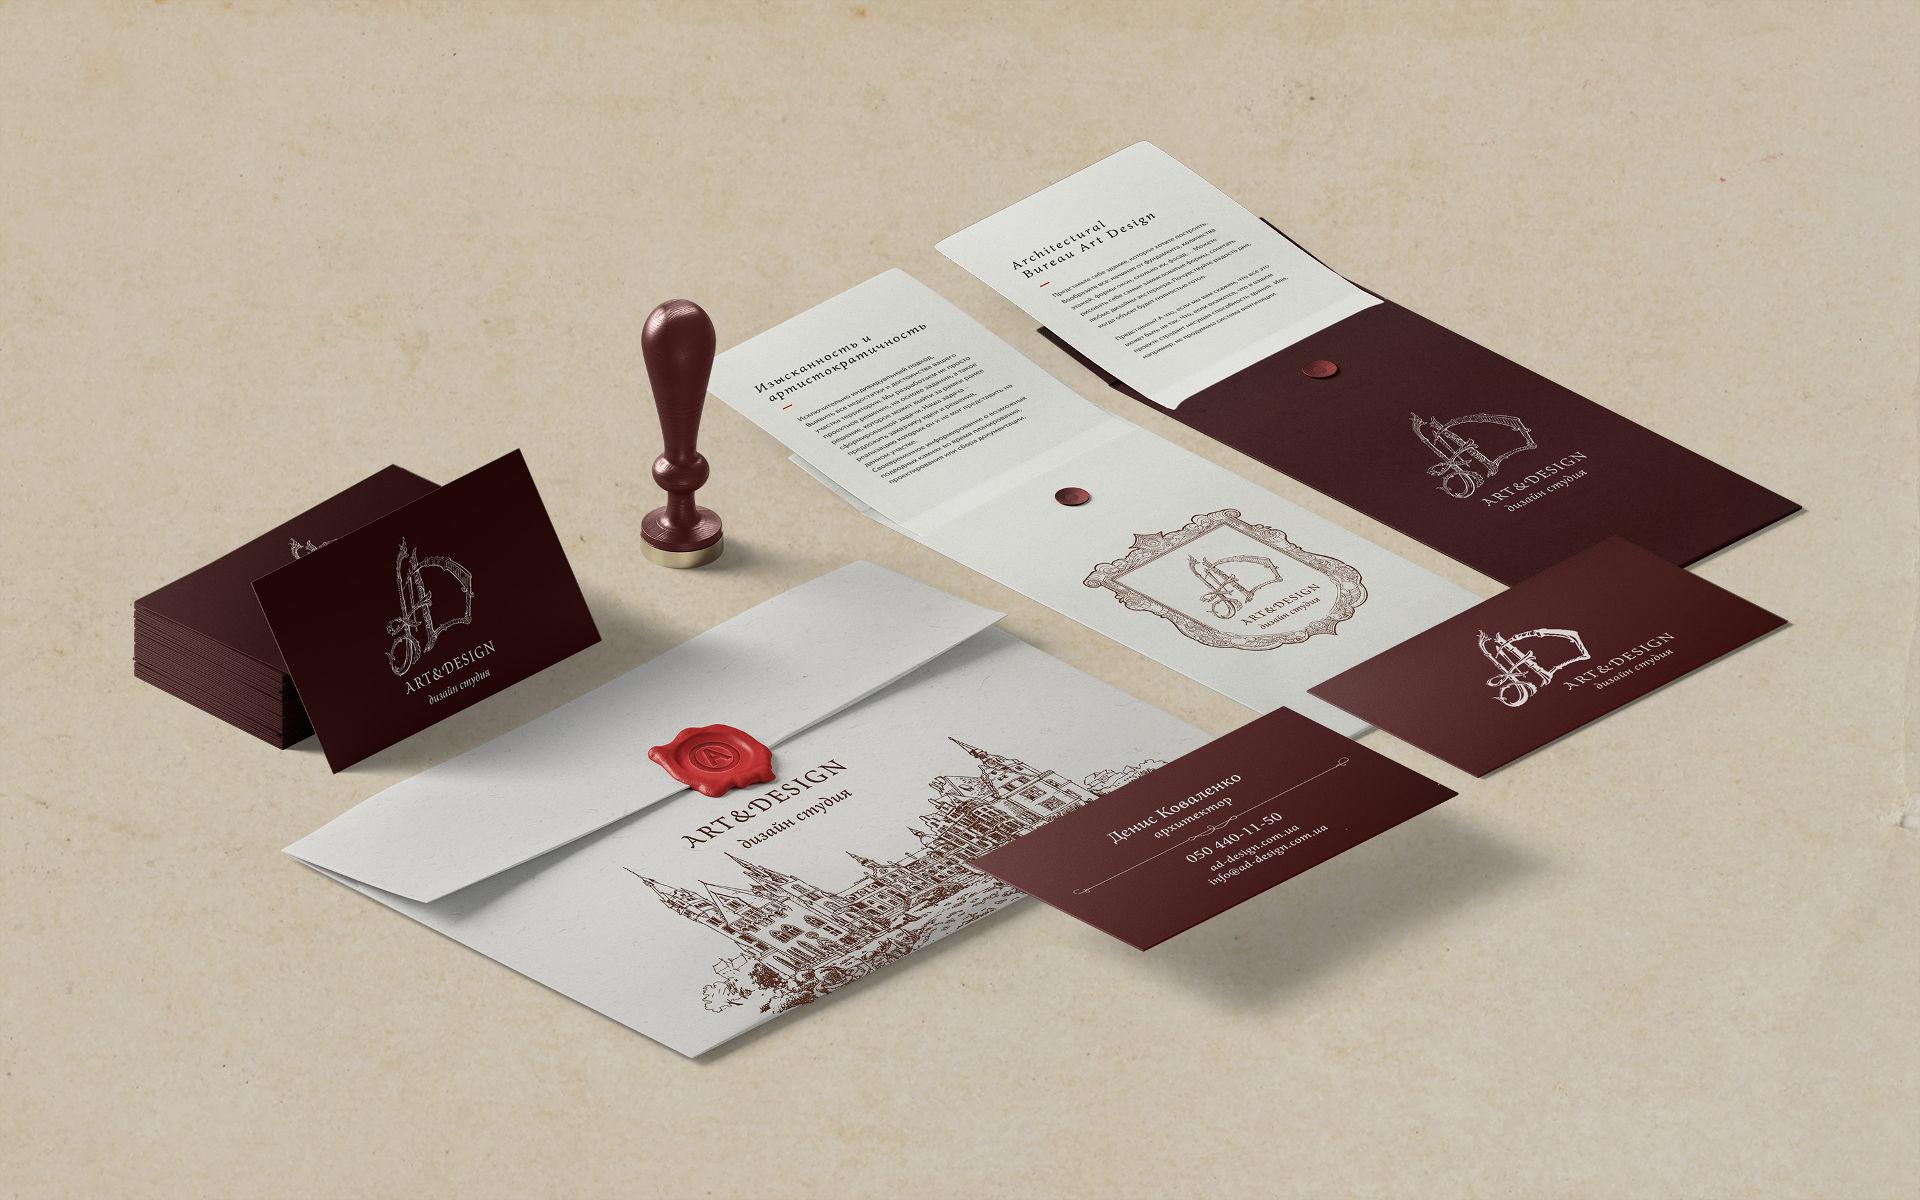 Дизайн of the corporate identity архитектурной студии, Architecture studio corporate identity